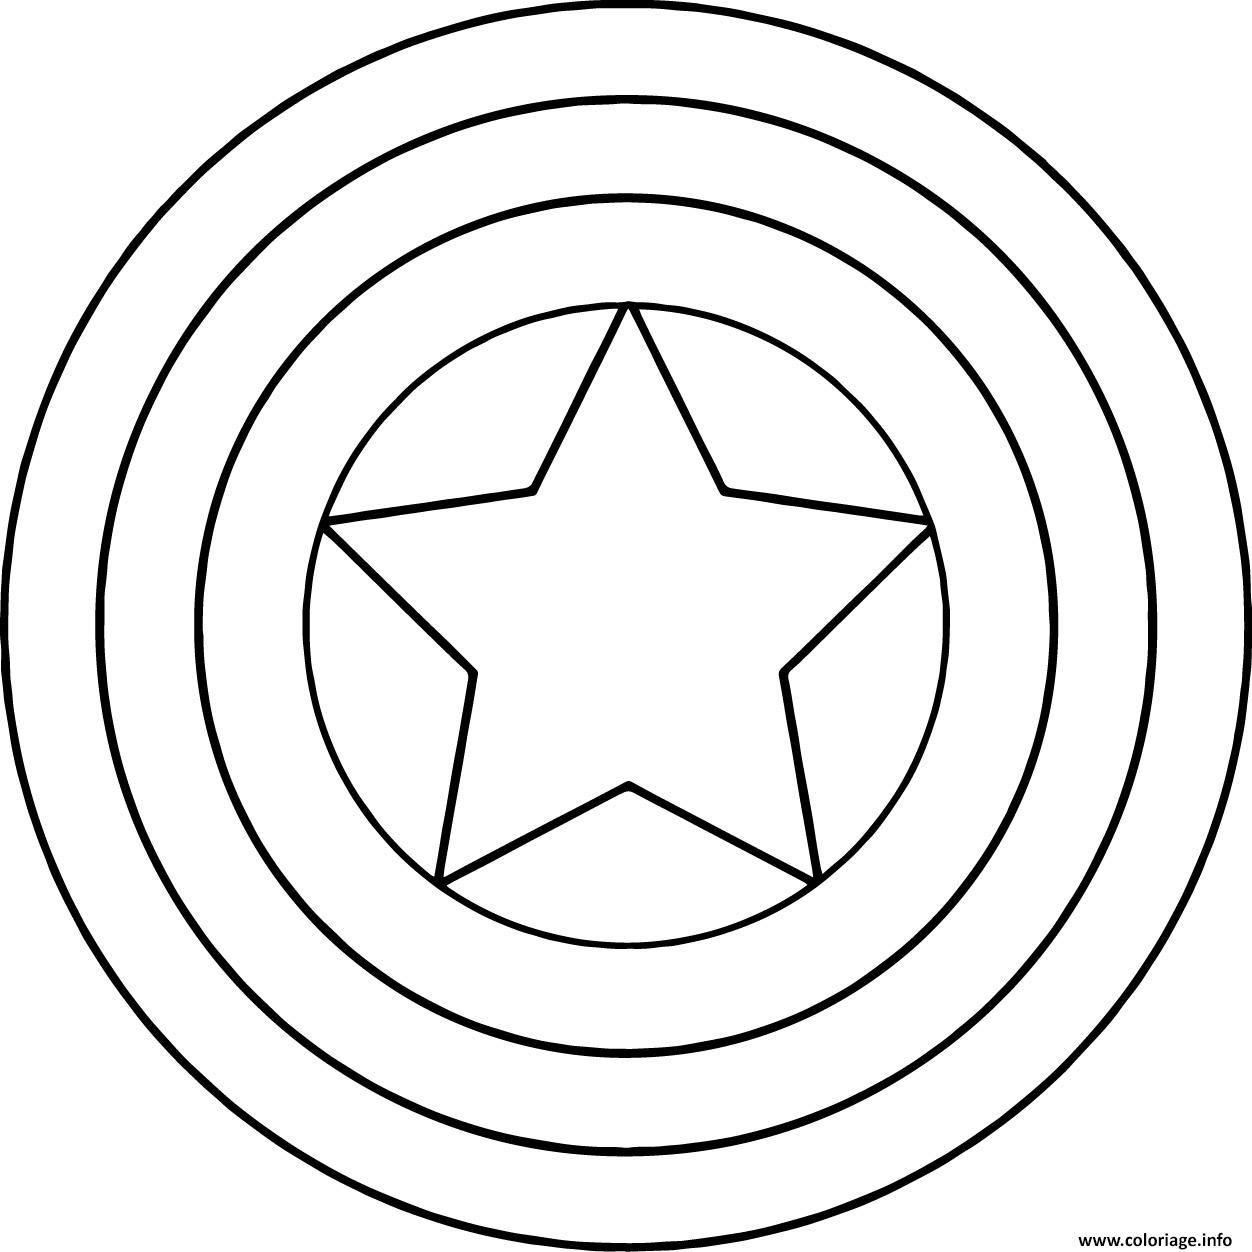 1252x1252 Superhero Symbol Coloring Pages Superheroes Symbols